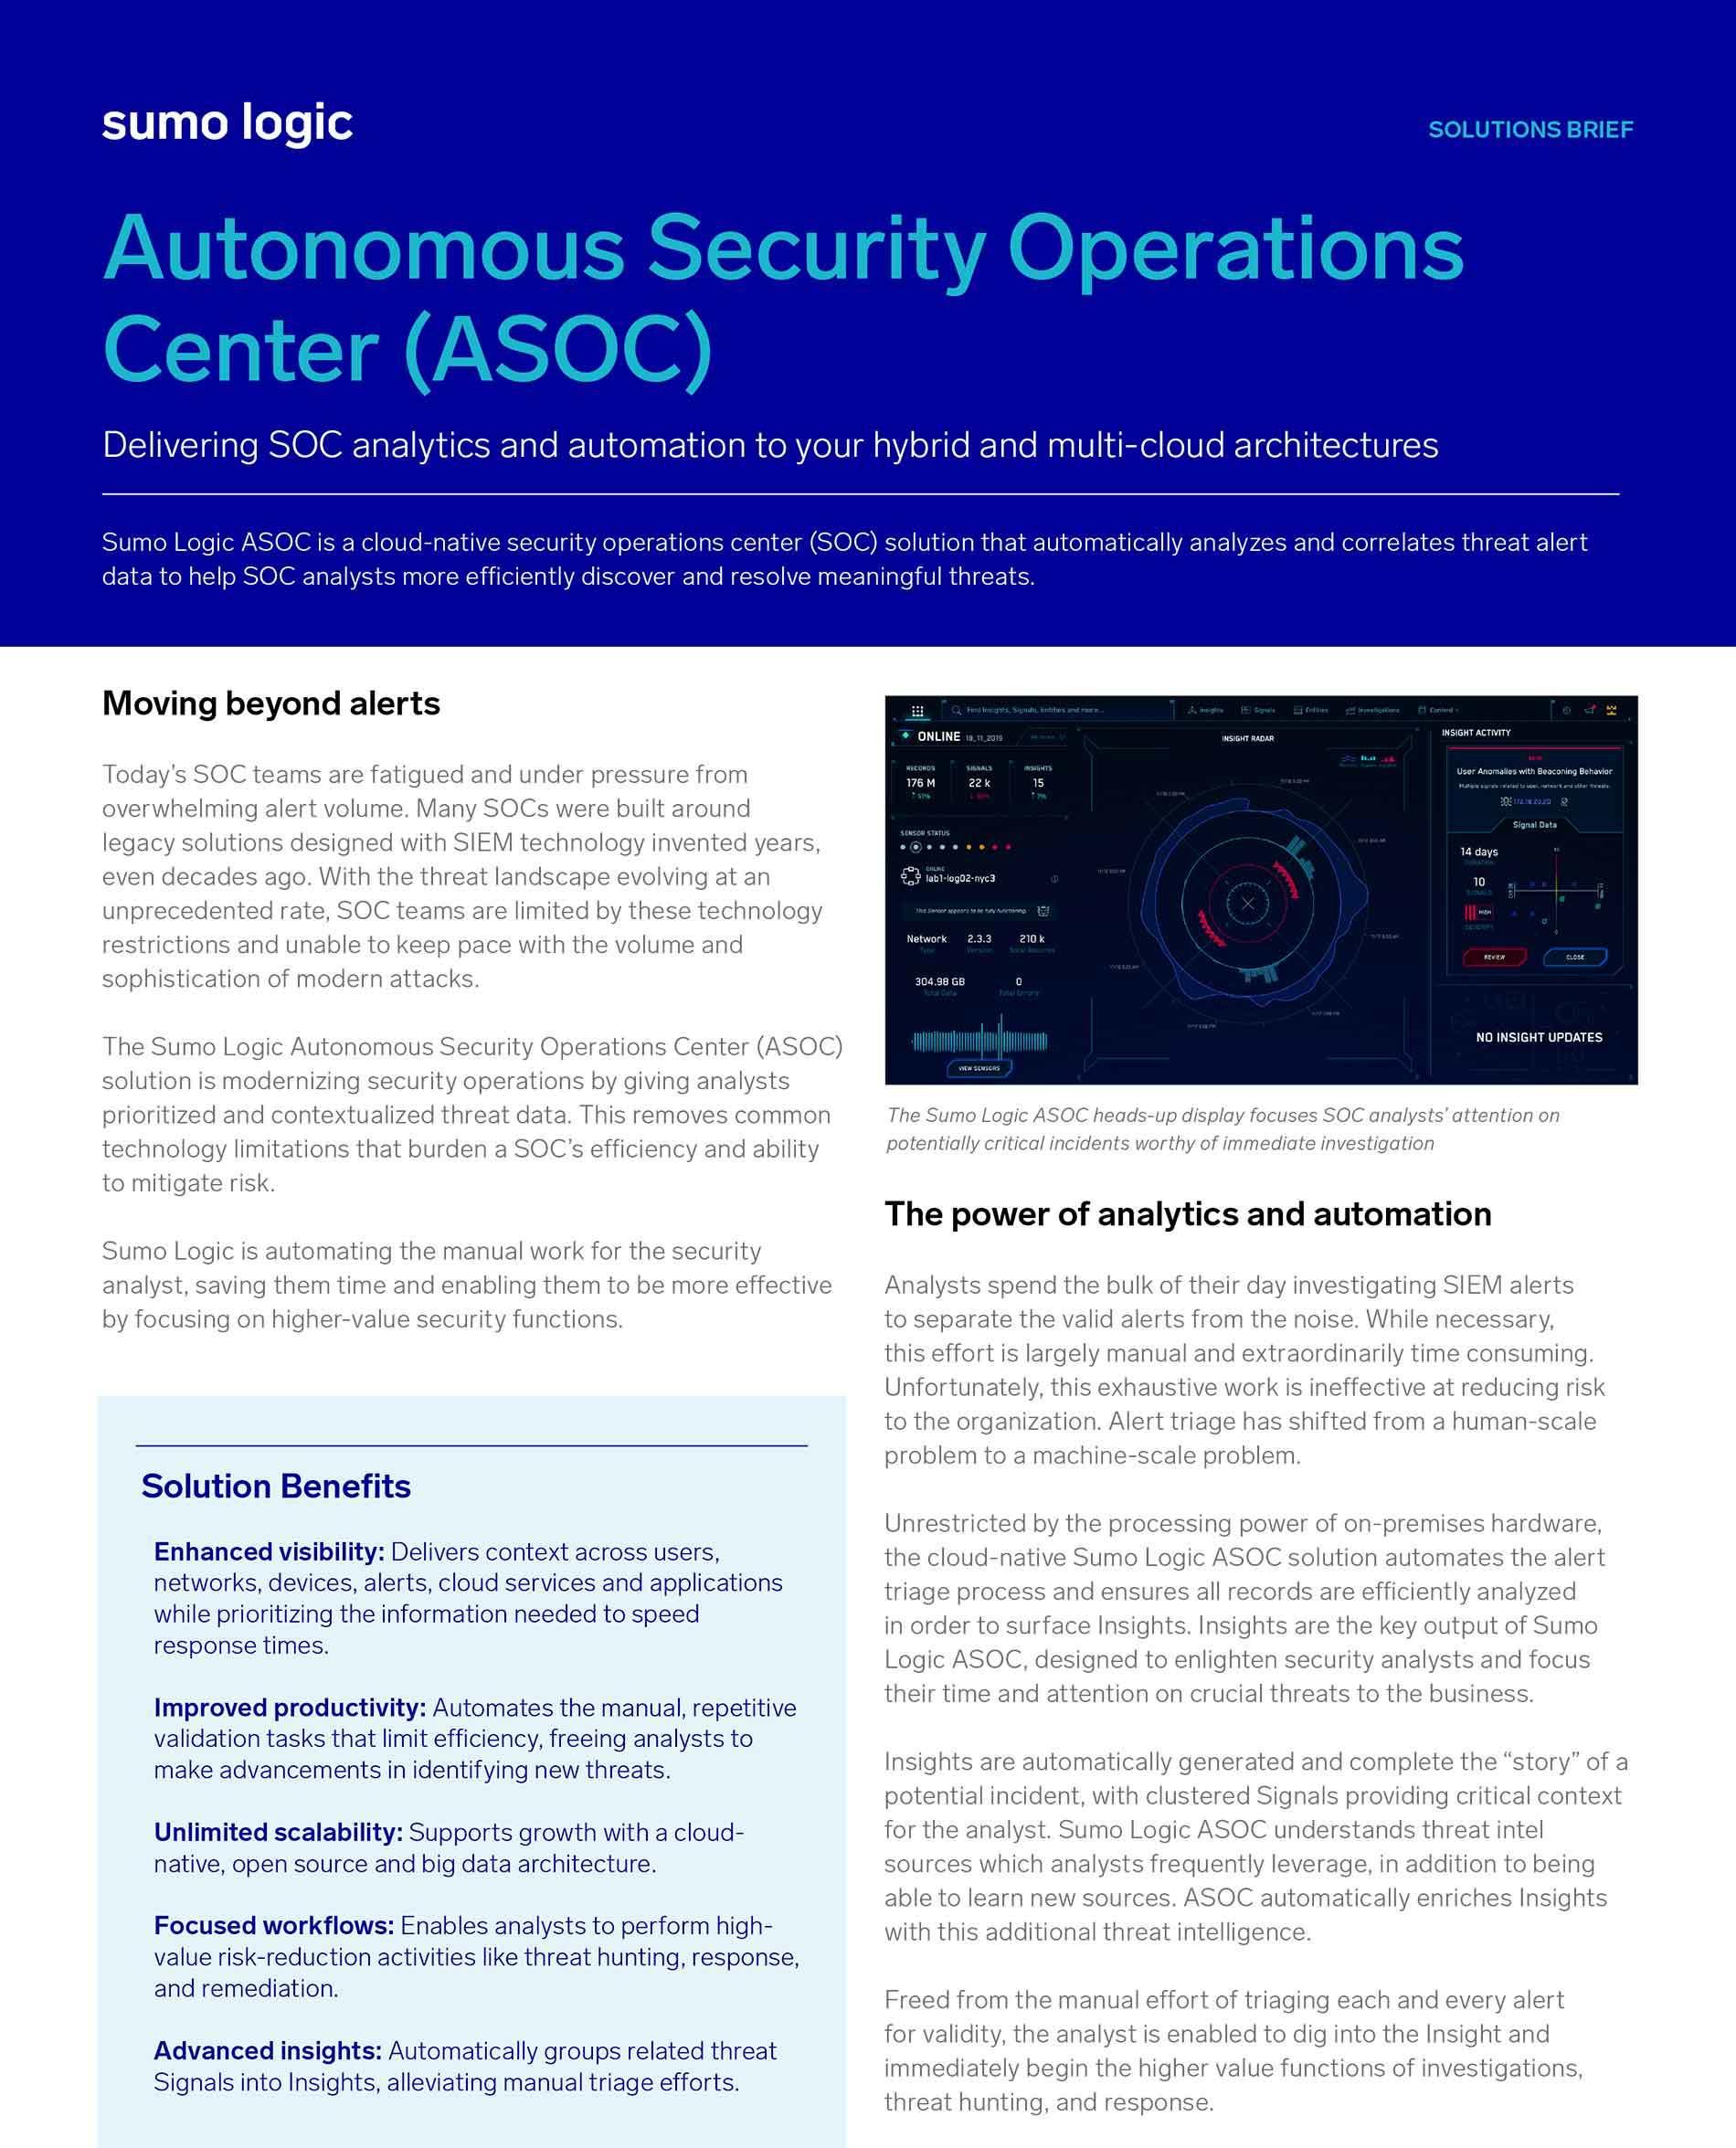 Autonomous Security Operations Center (ASOC)